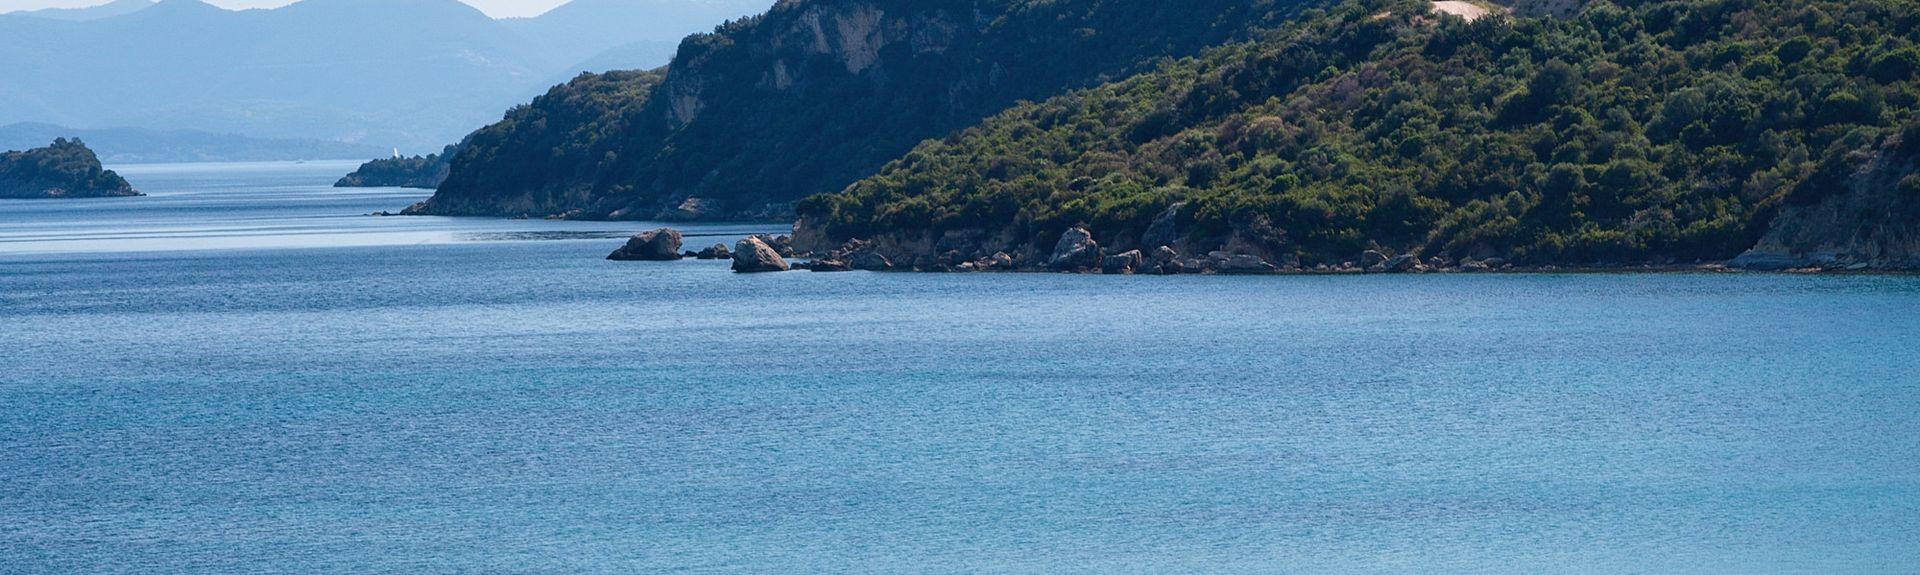 Anaktorio, Peloponnesos, Kreikka